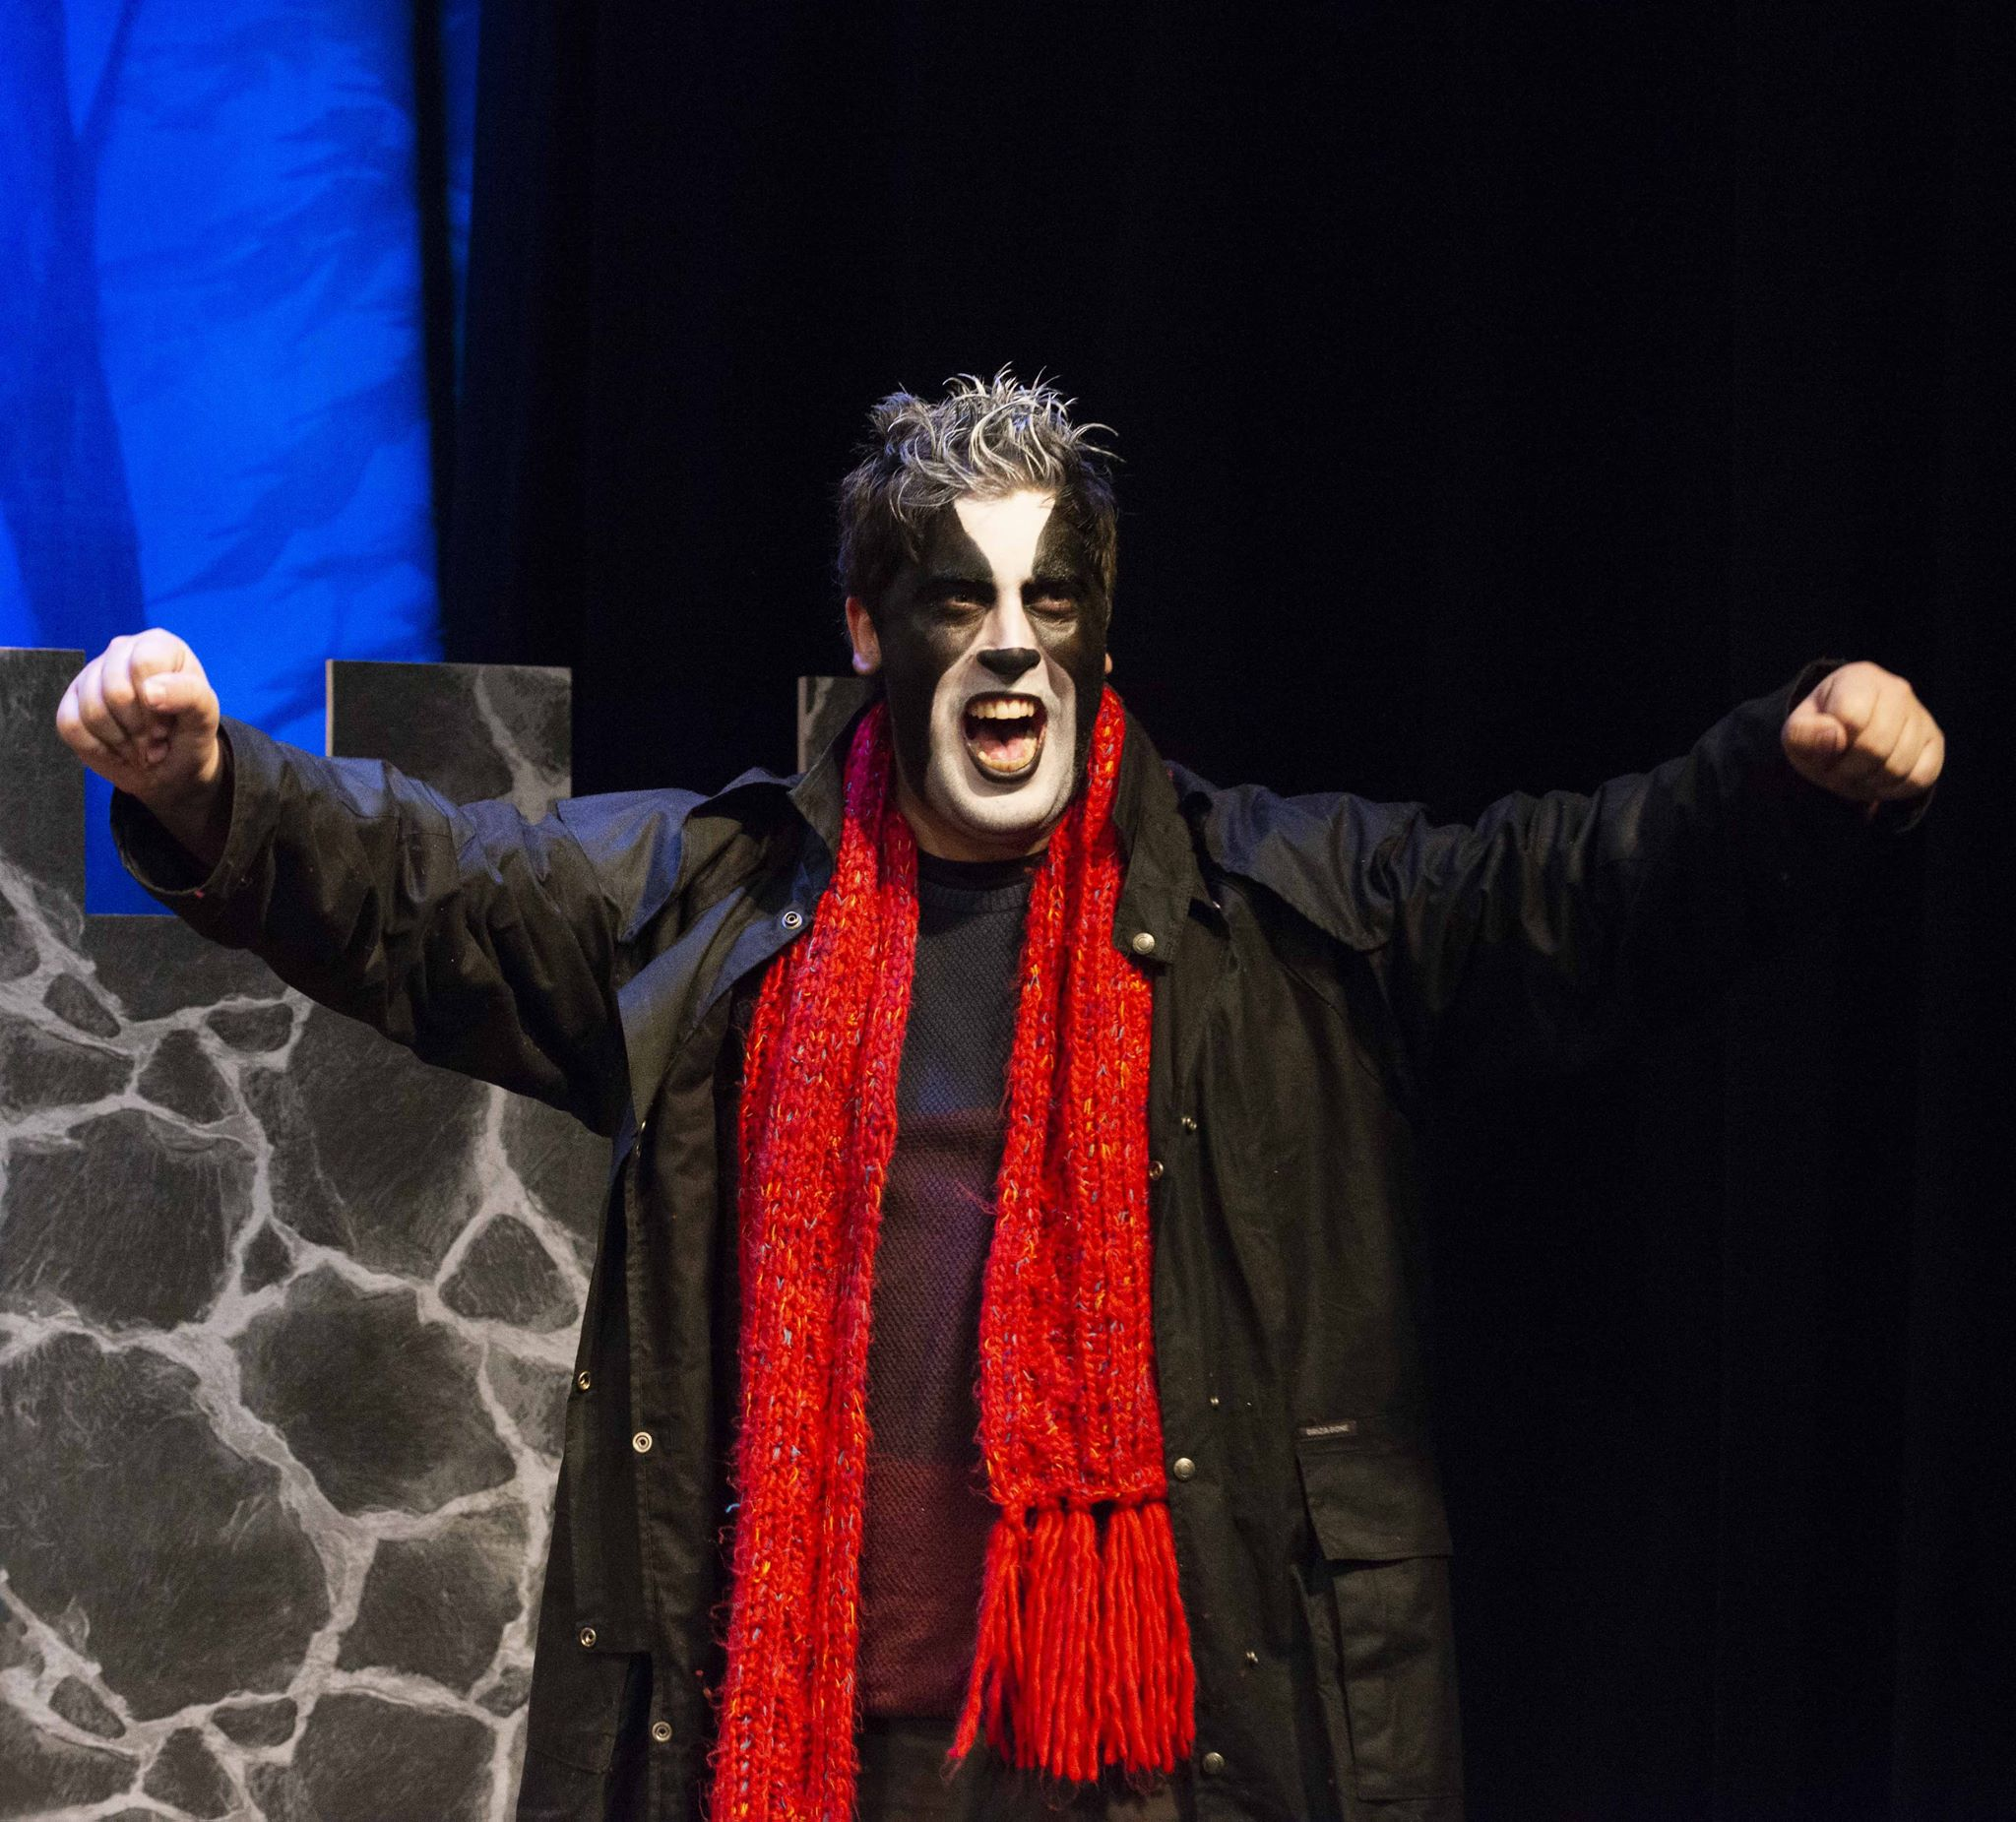 Aidan Niarros as Badger